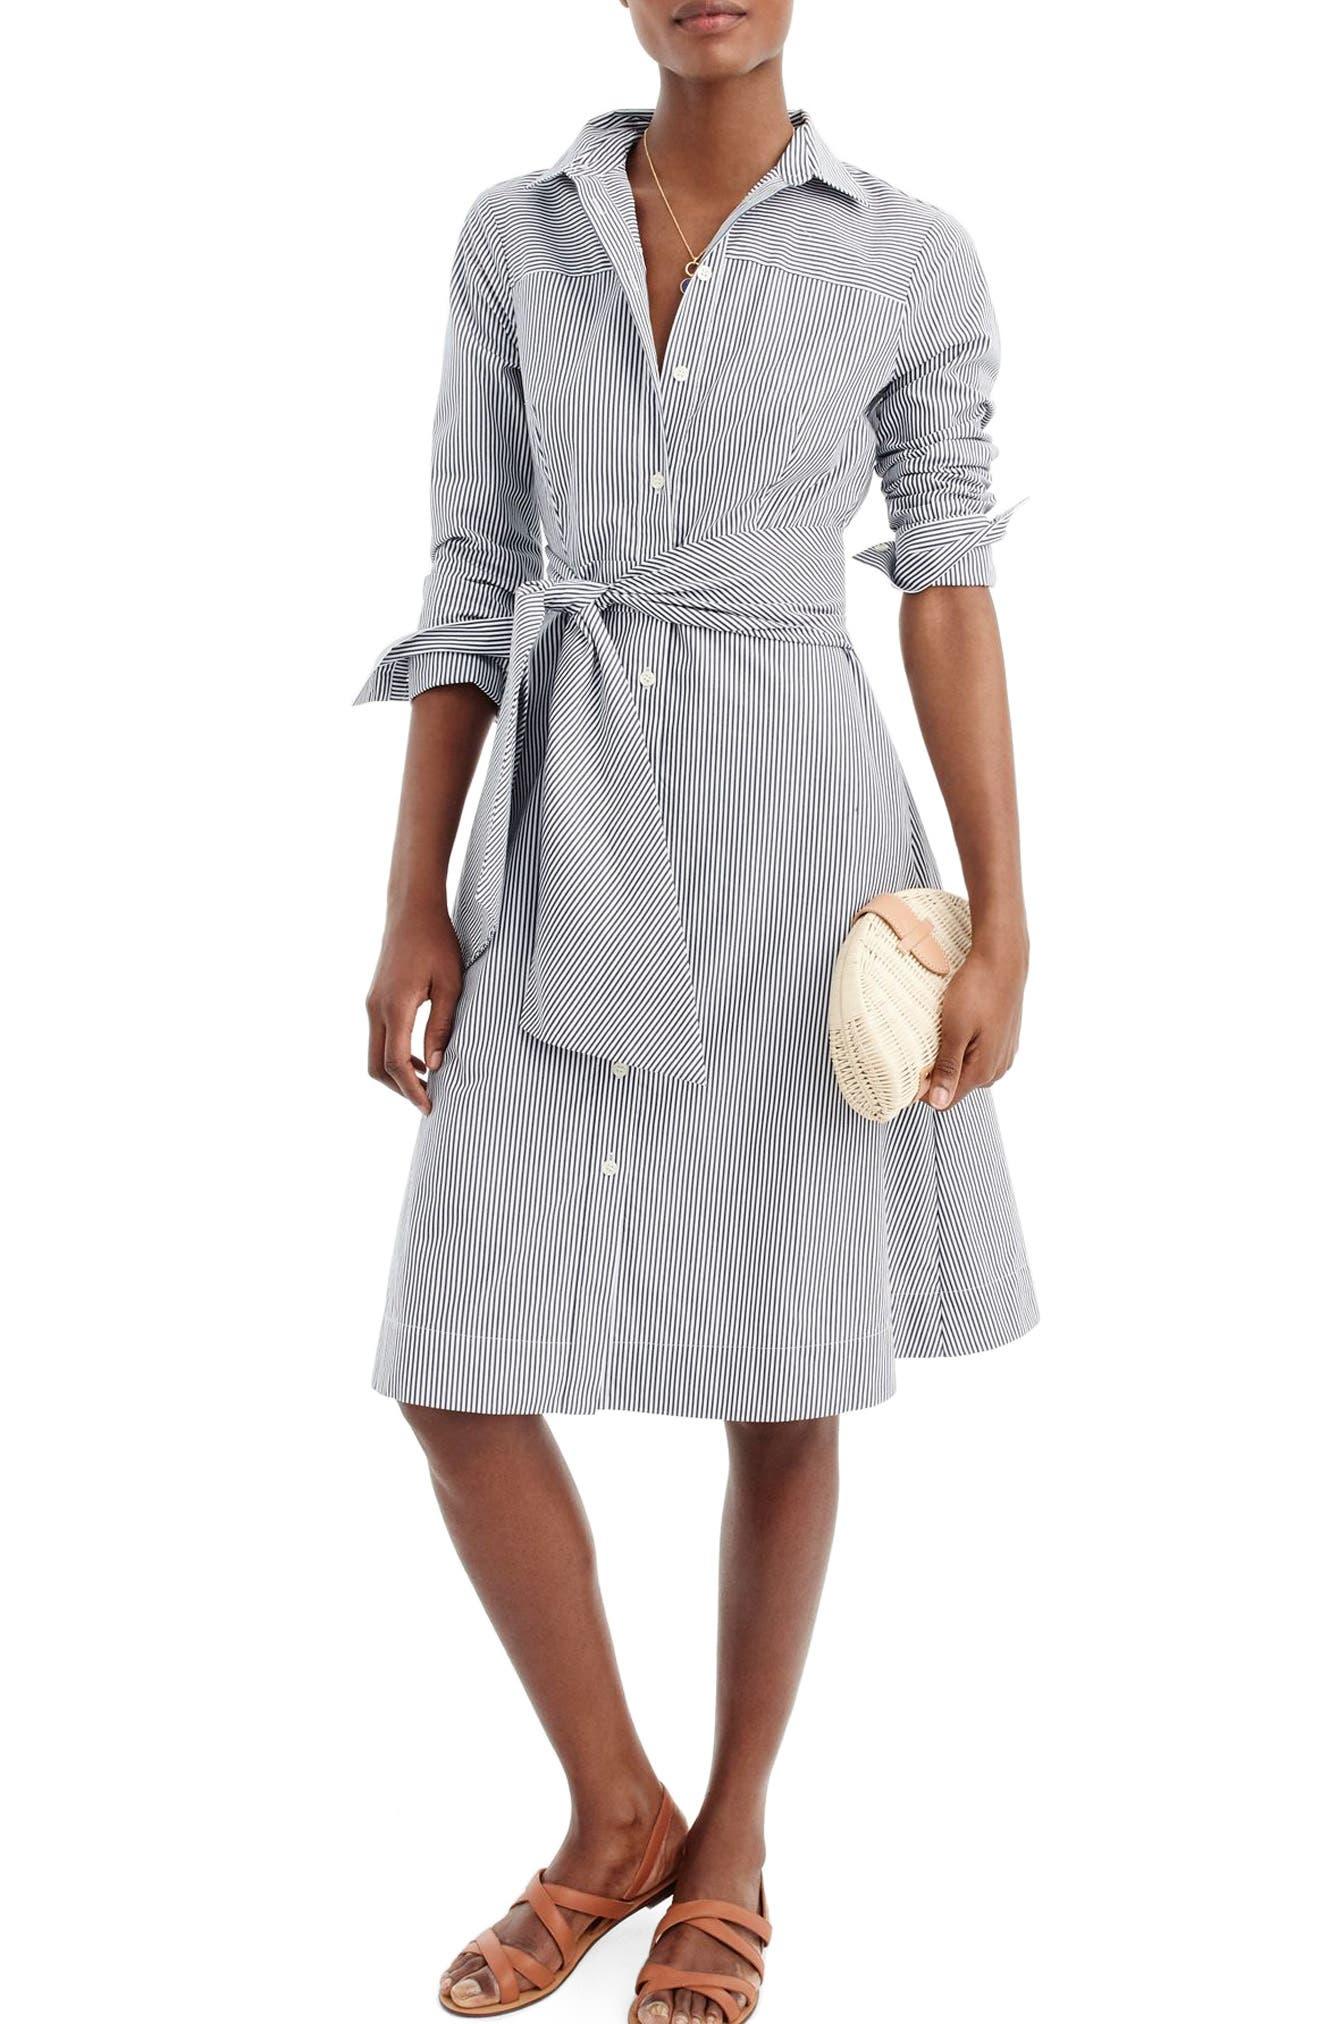 Main Image - J.Crew Maribou Stripe Cotton Shirtdress (Regular & Petite)